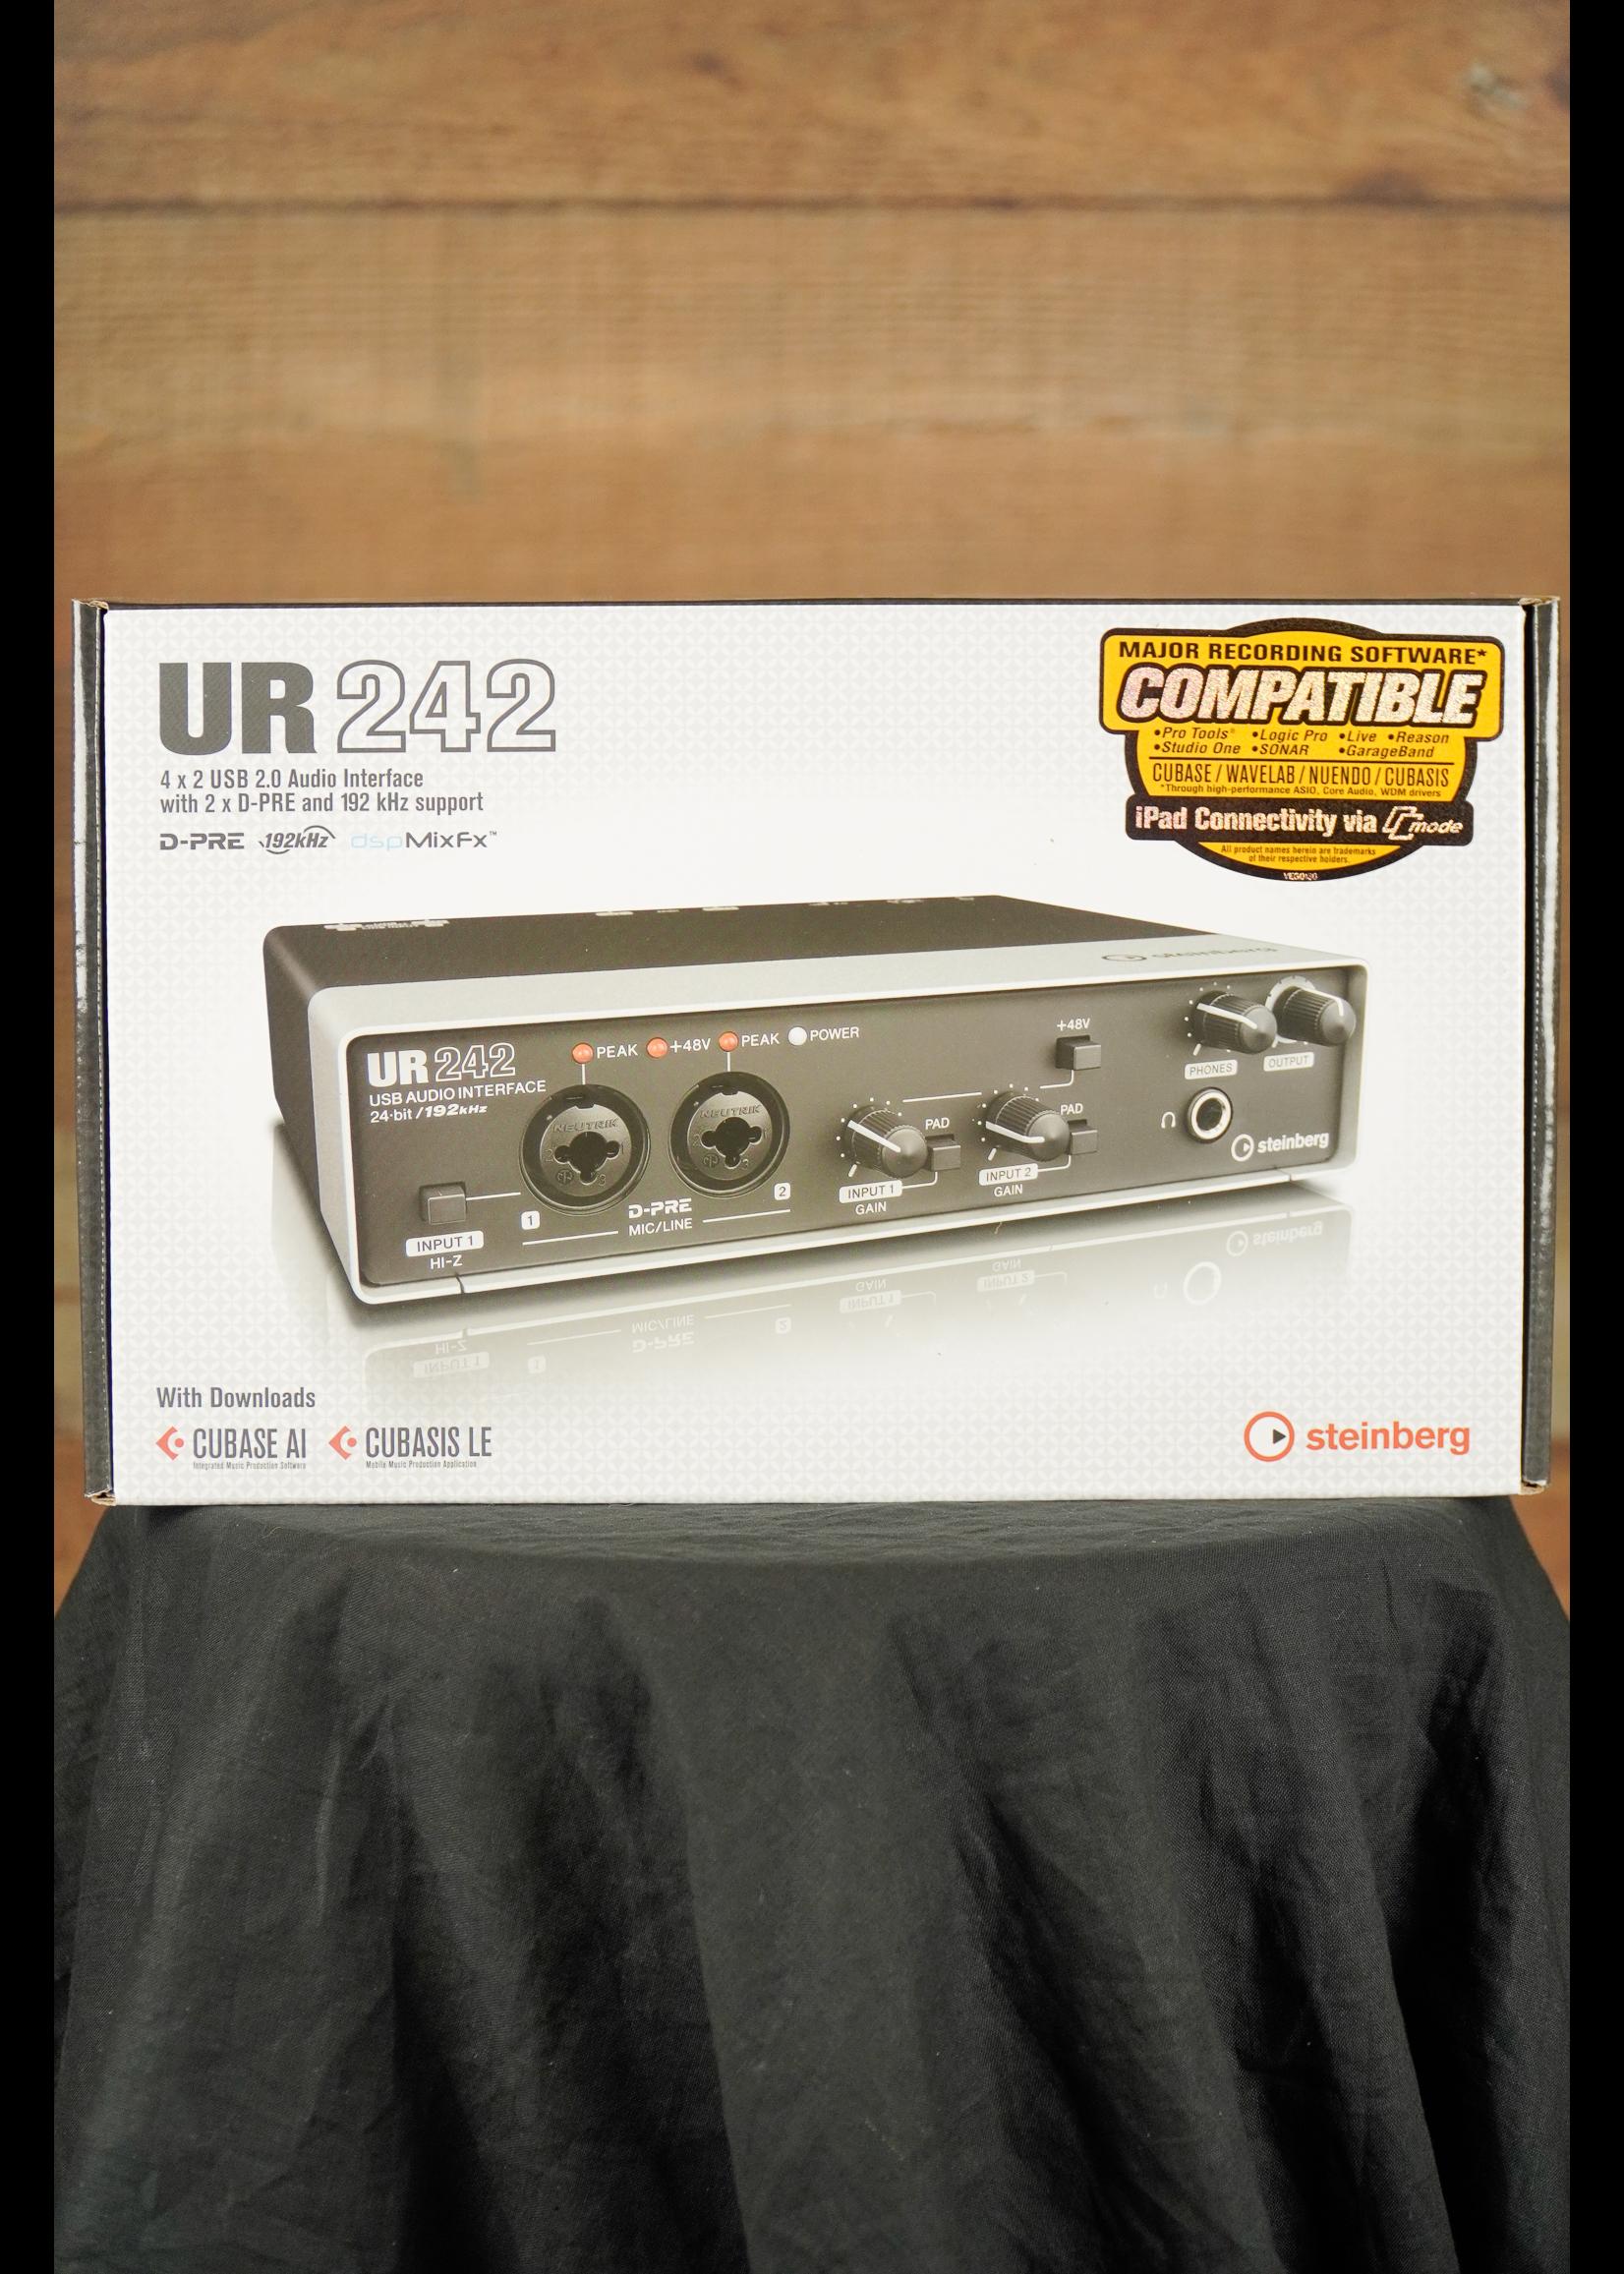 Steinberg Steinberg UR242 4x2 USB 2.0 Audio Interface w/ MIDI I/O